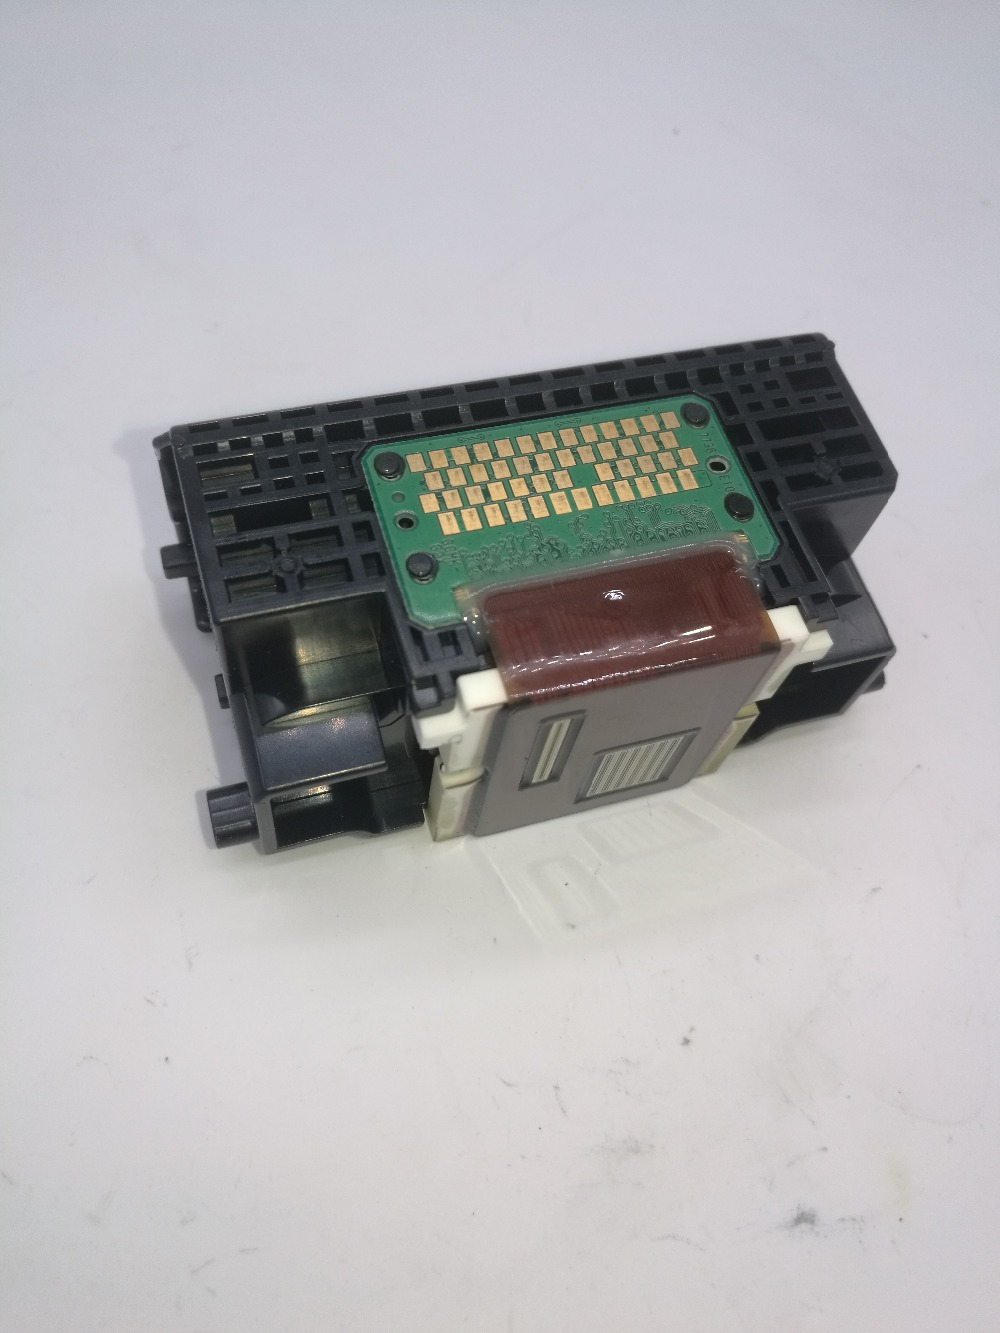 Druckkopf NEW Printhead QY6-0072 IP4600 IP4700 MP630 MP640 FOR CANONDruckkopf NEW Printhead QY6-0072 IP4600 IP4700 MP630 MP640 FOR CANON